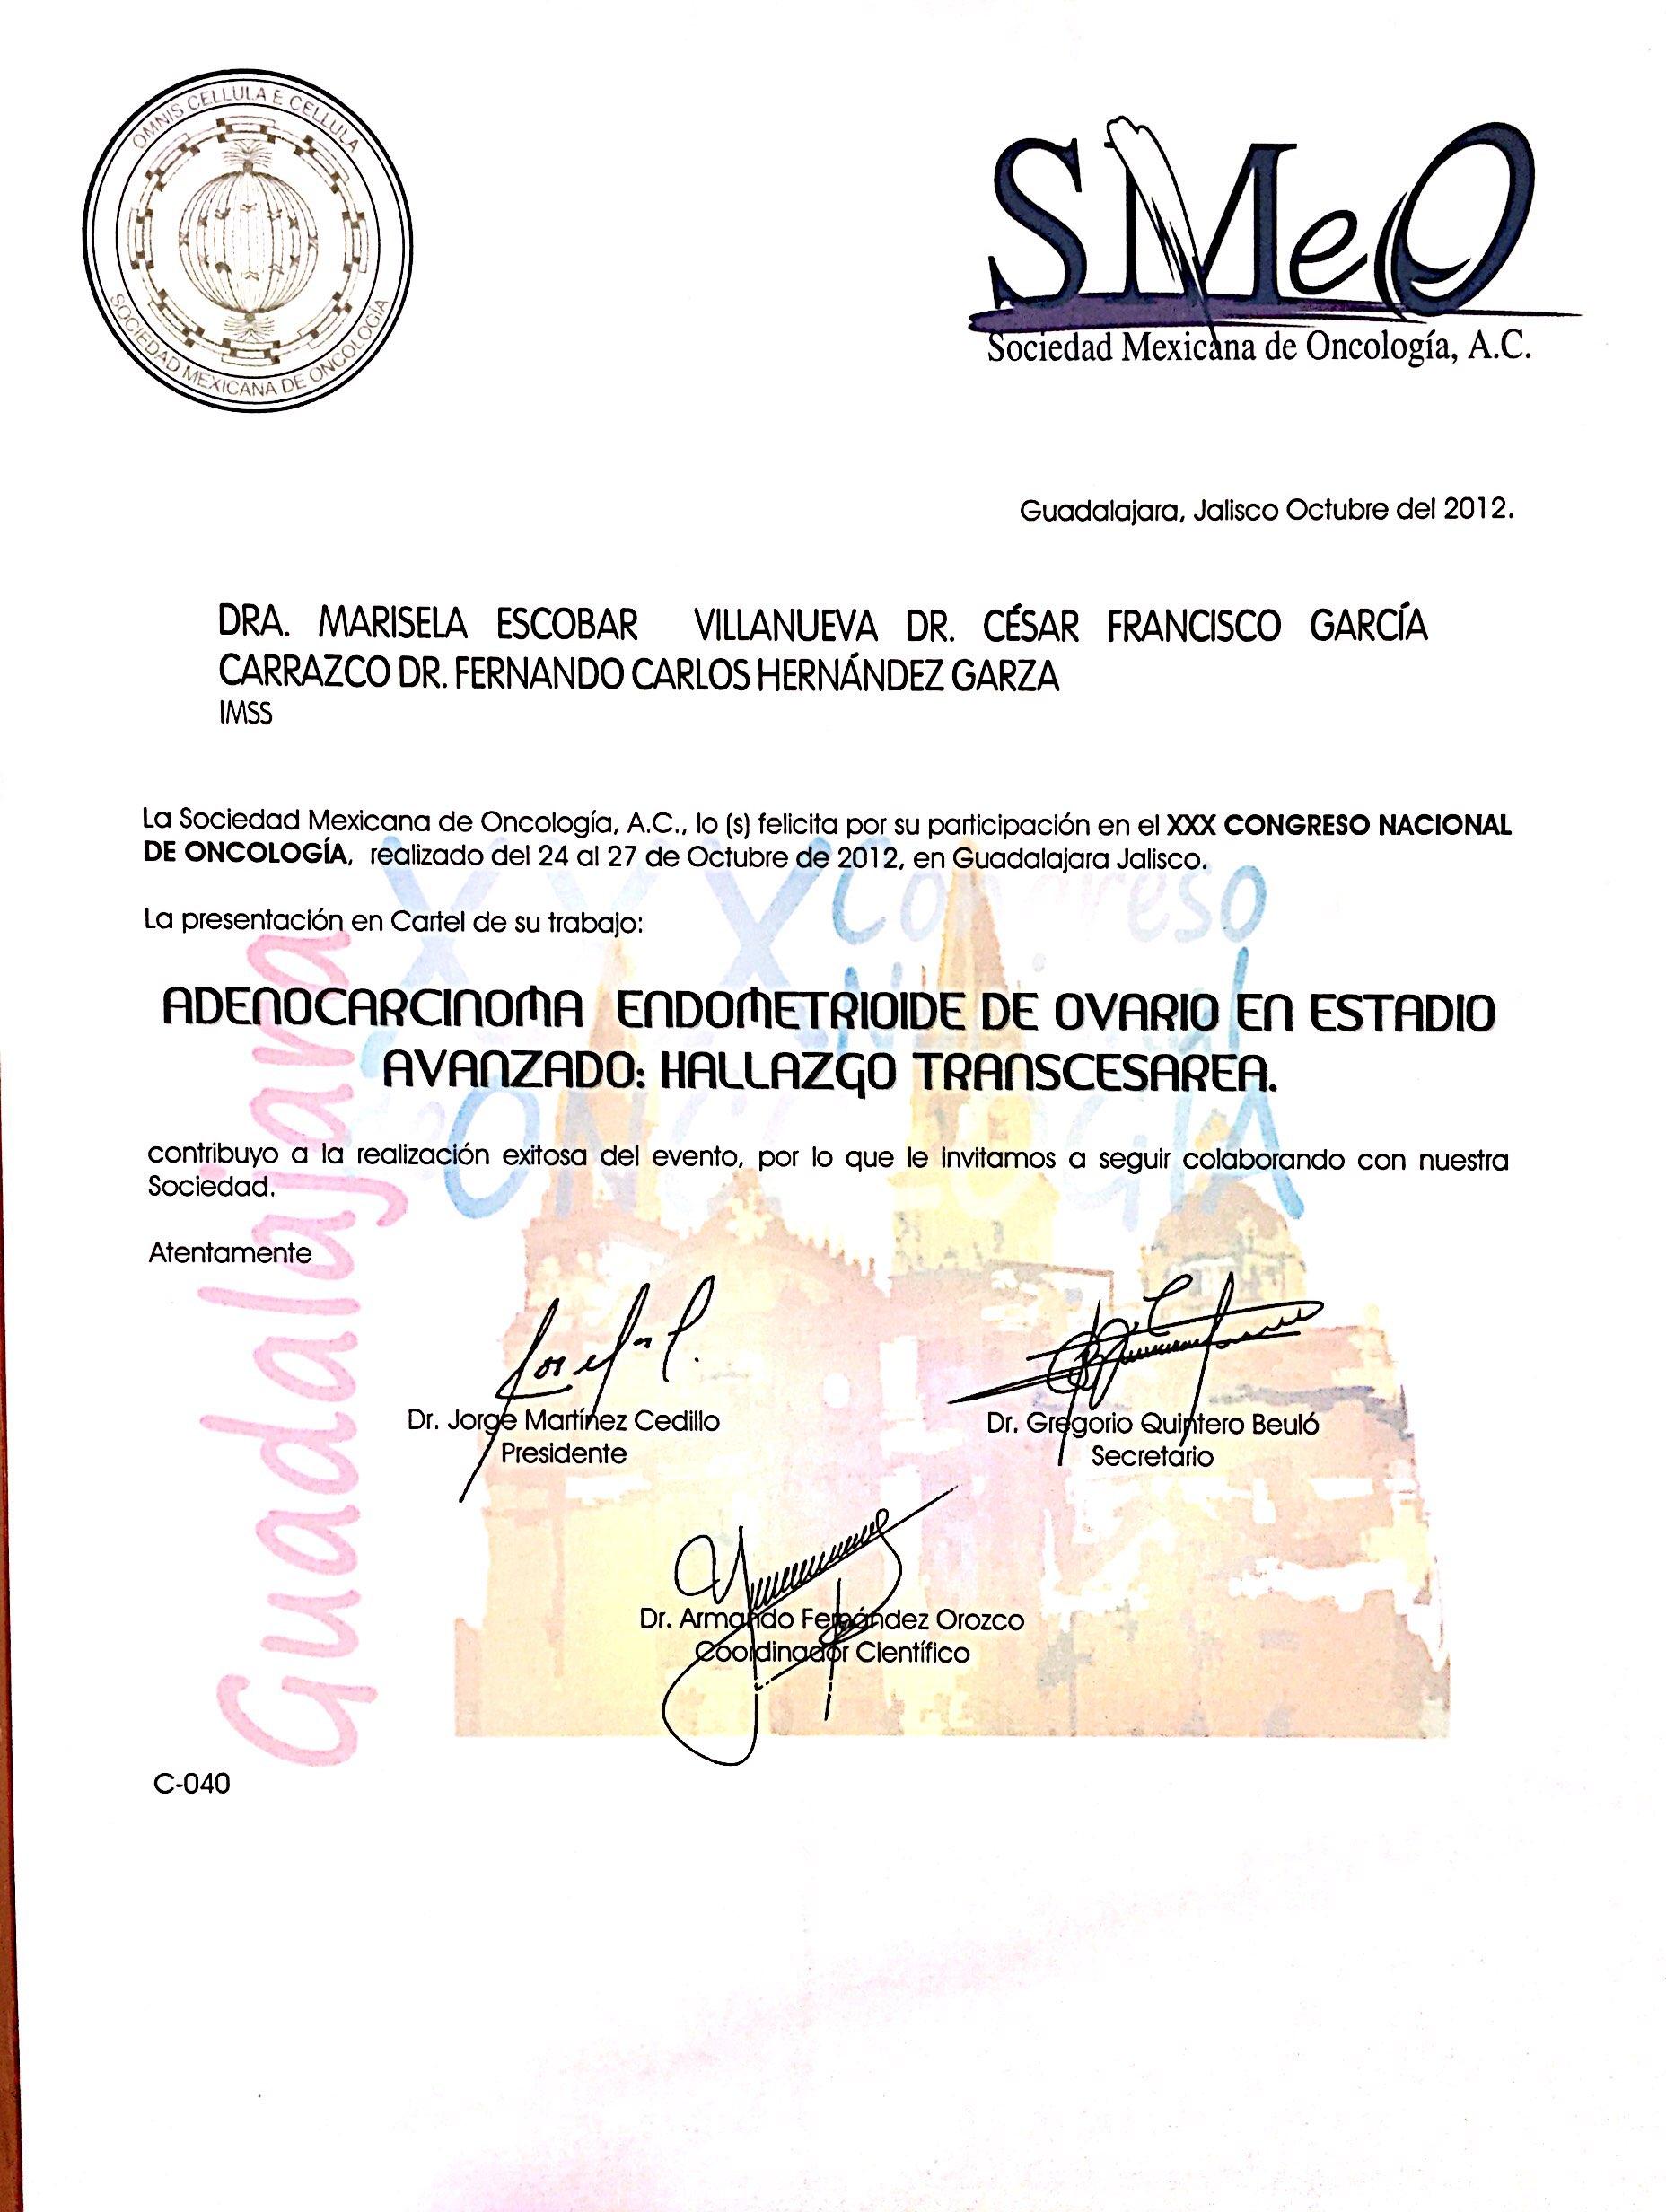 Nuevo doc 2018-02-20 11.21.39_28